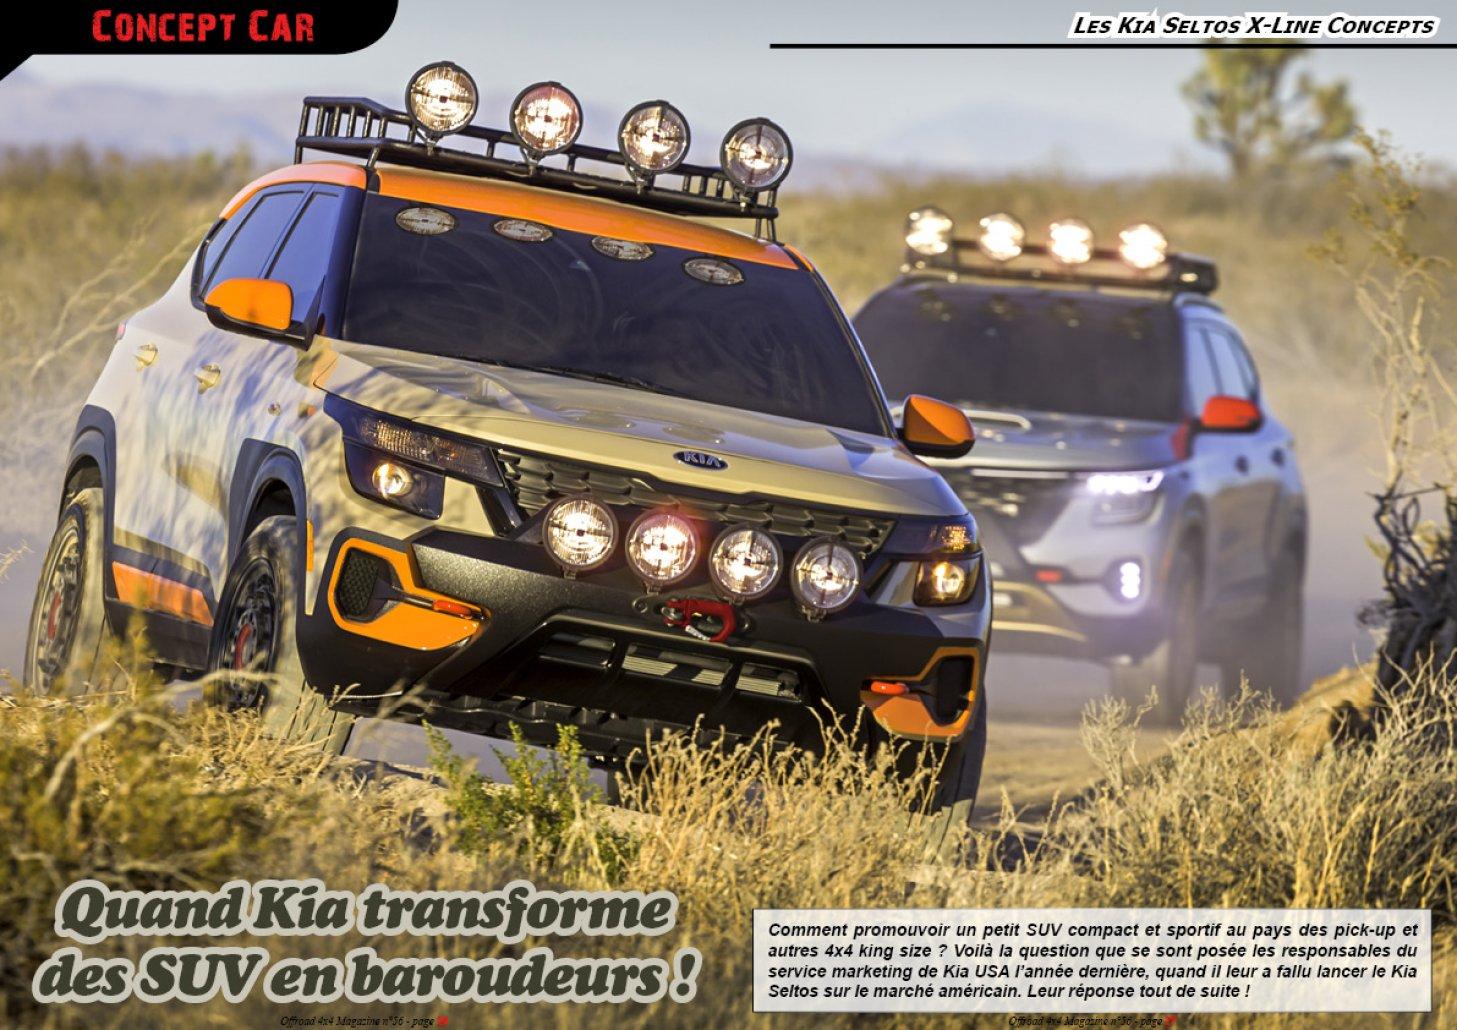 Les Kia Seltos X-Line Concepts